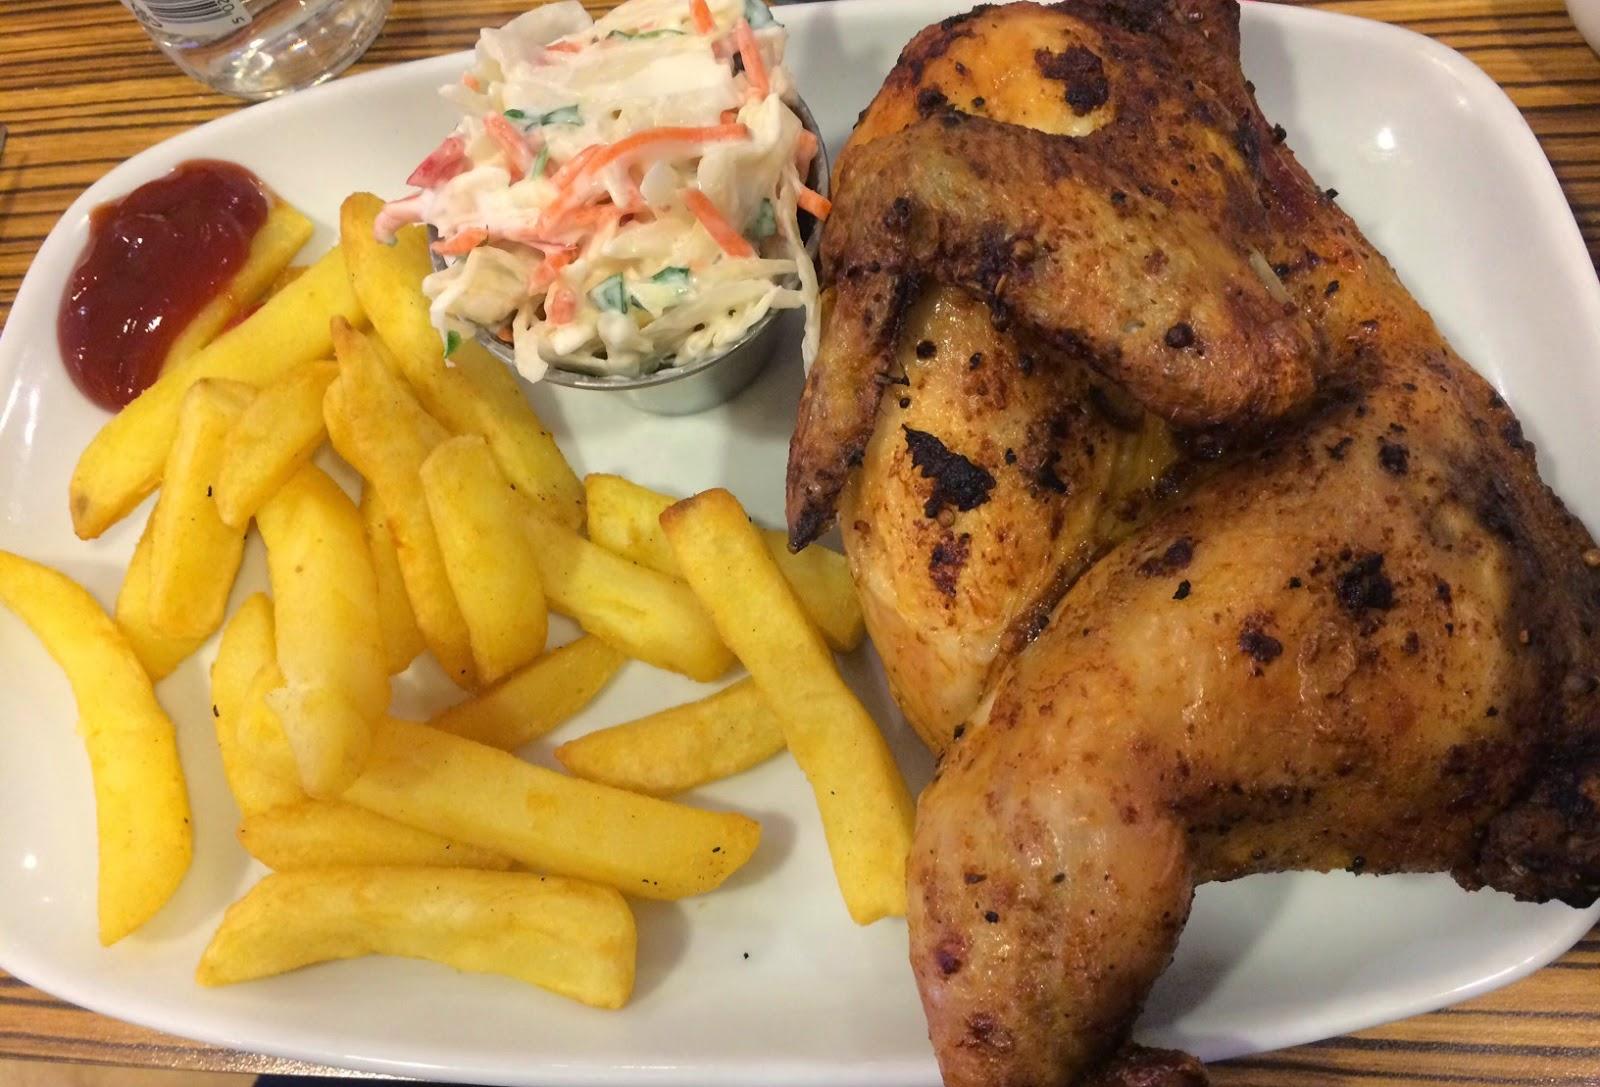 Travelodge Birmingham Airport food options